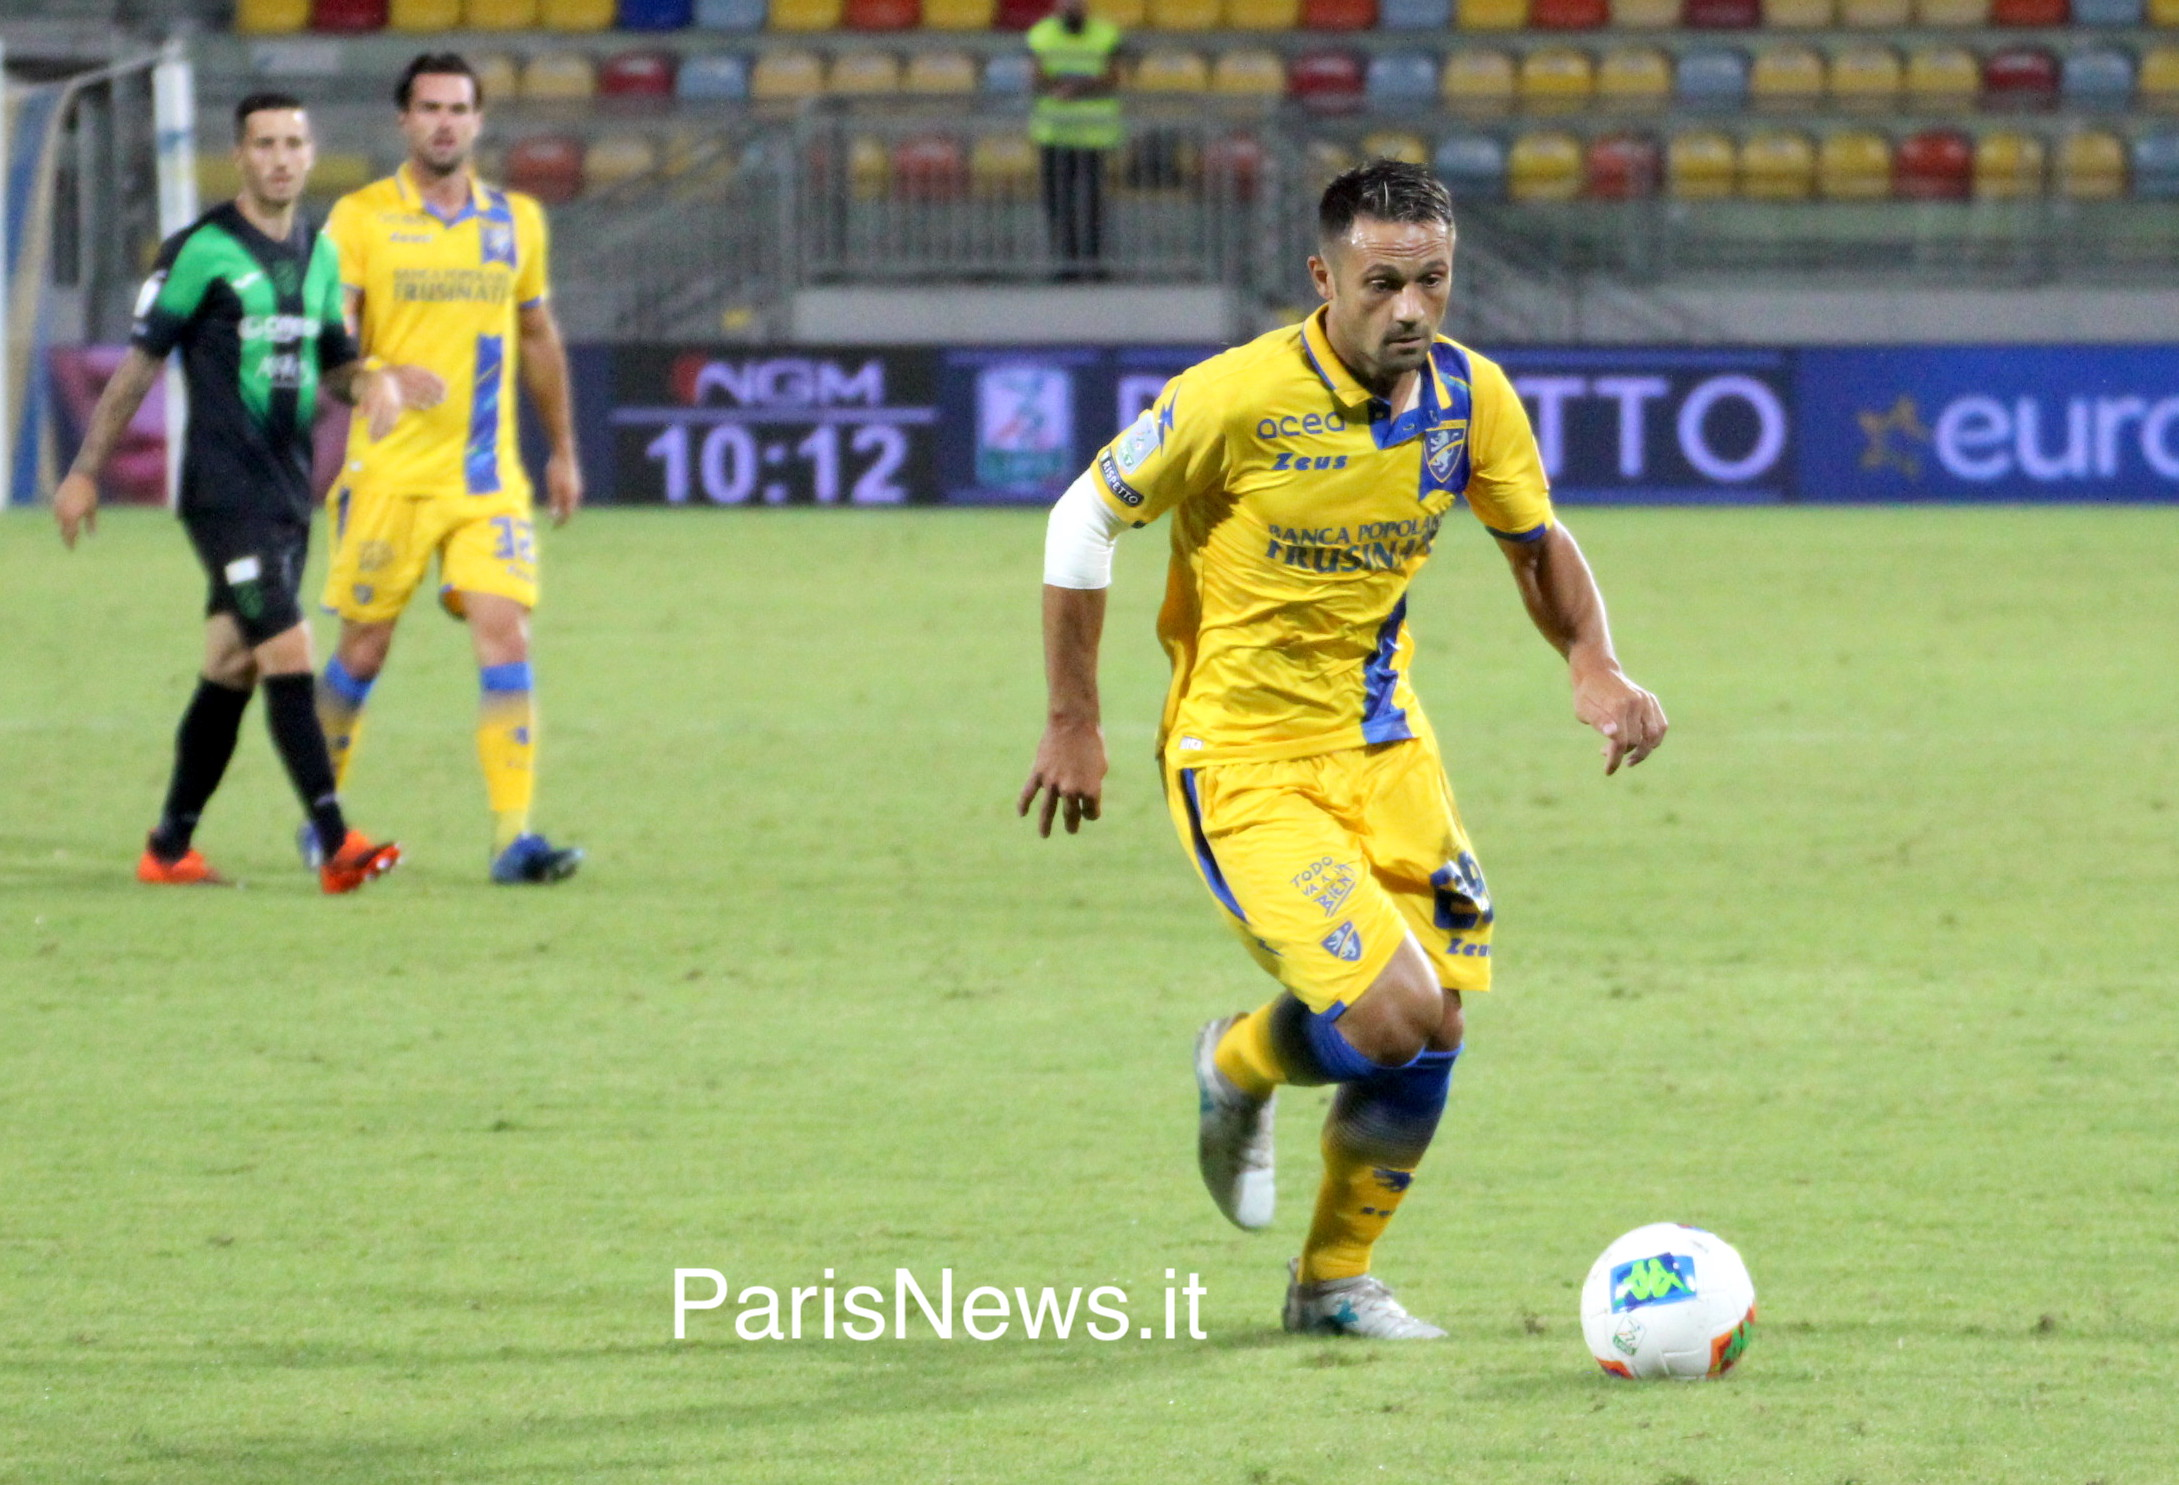 Frosinone batte Pescara 2-0